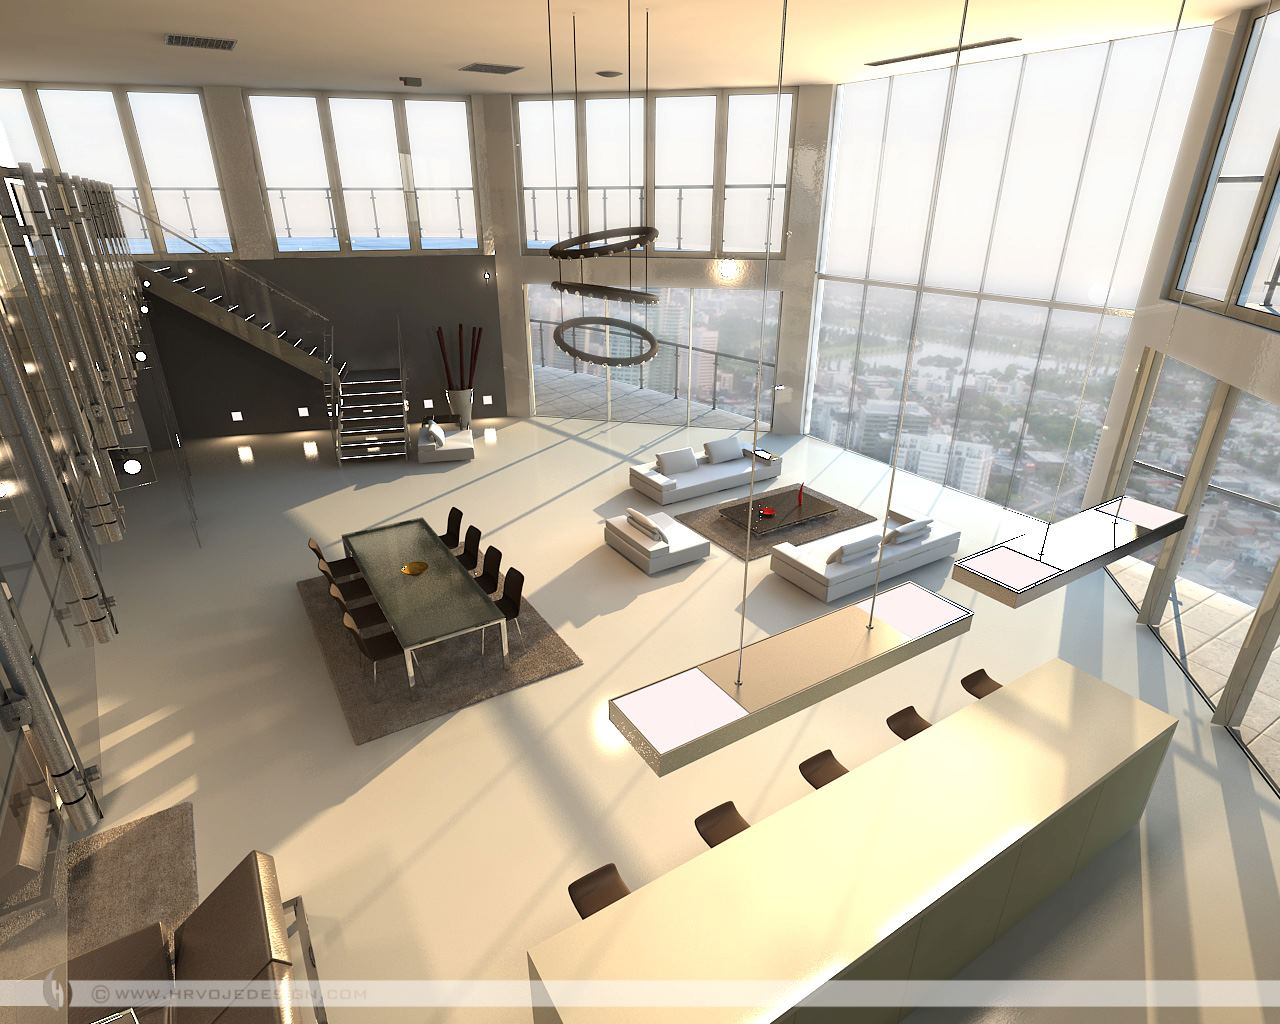 Open plan penthouse design layout Interior Design Ideas. - ^